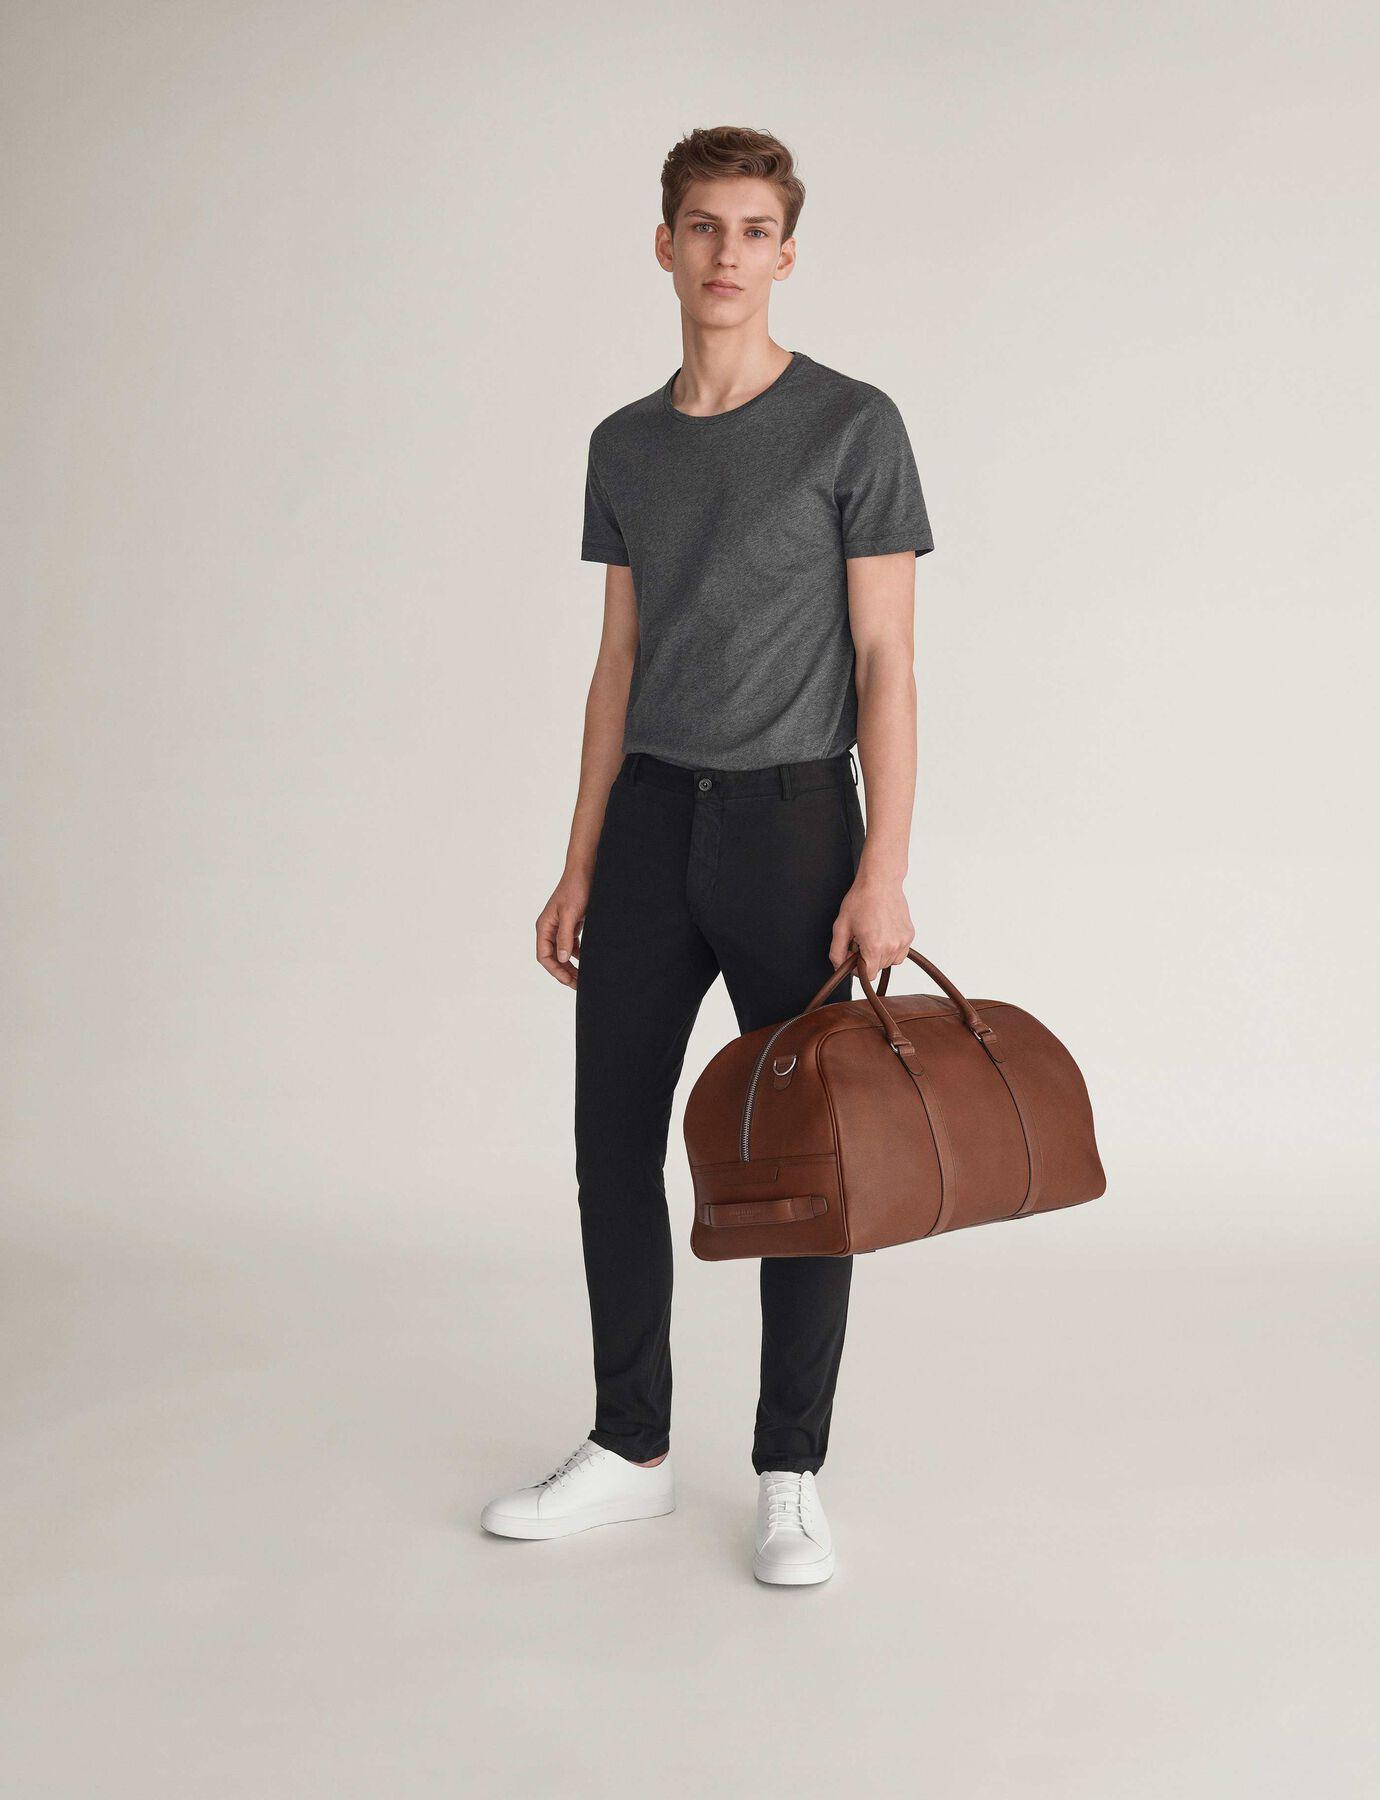 Pinchon weekend bag in Medium Brown from Tiger of Sweden